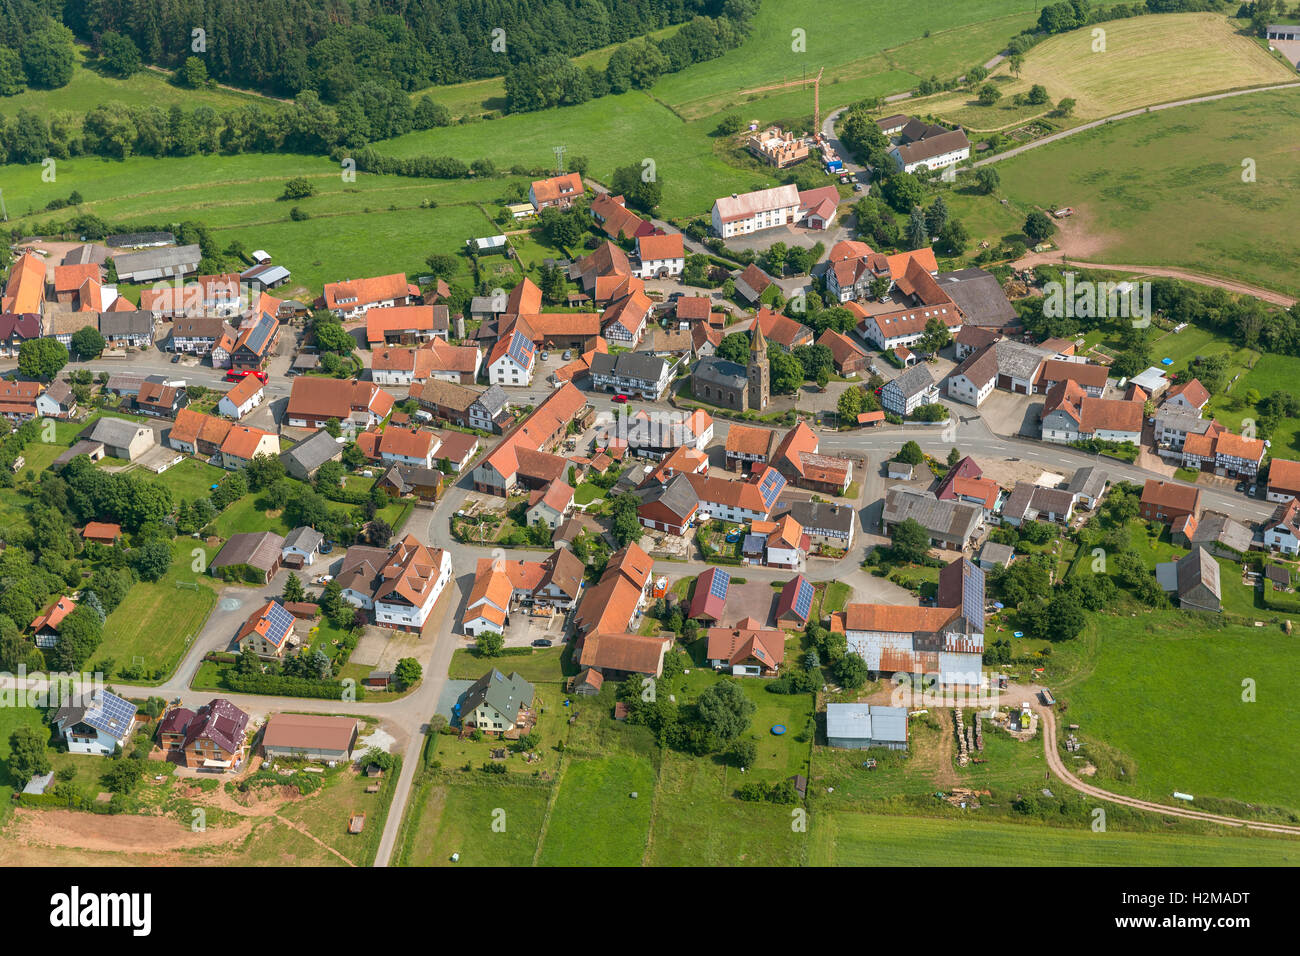 Aerial picture, Lichtenfels, Neukirchen, Sauerland, Hessen, Germany, Europe, aerial picture, birds-eyes view, aerial - Stock Image